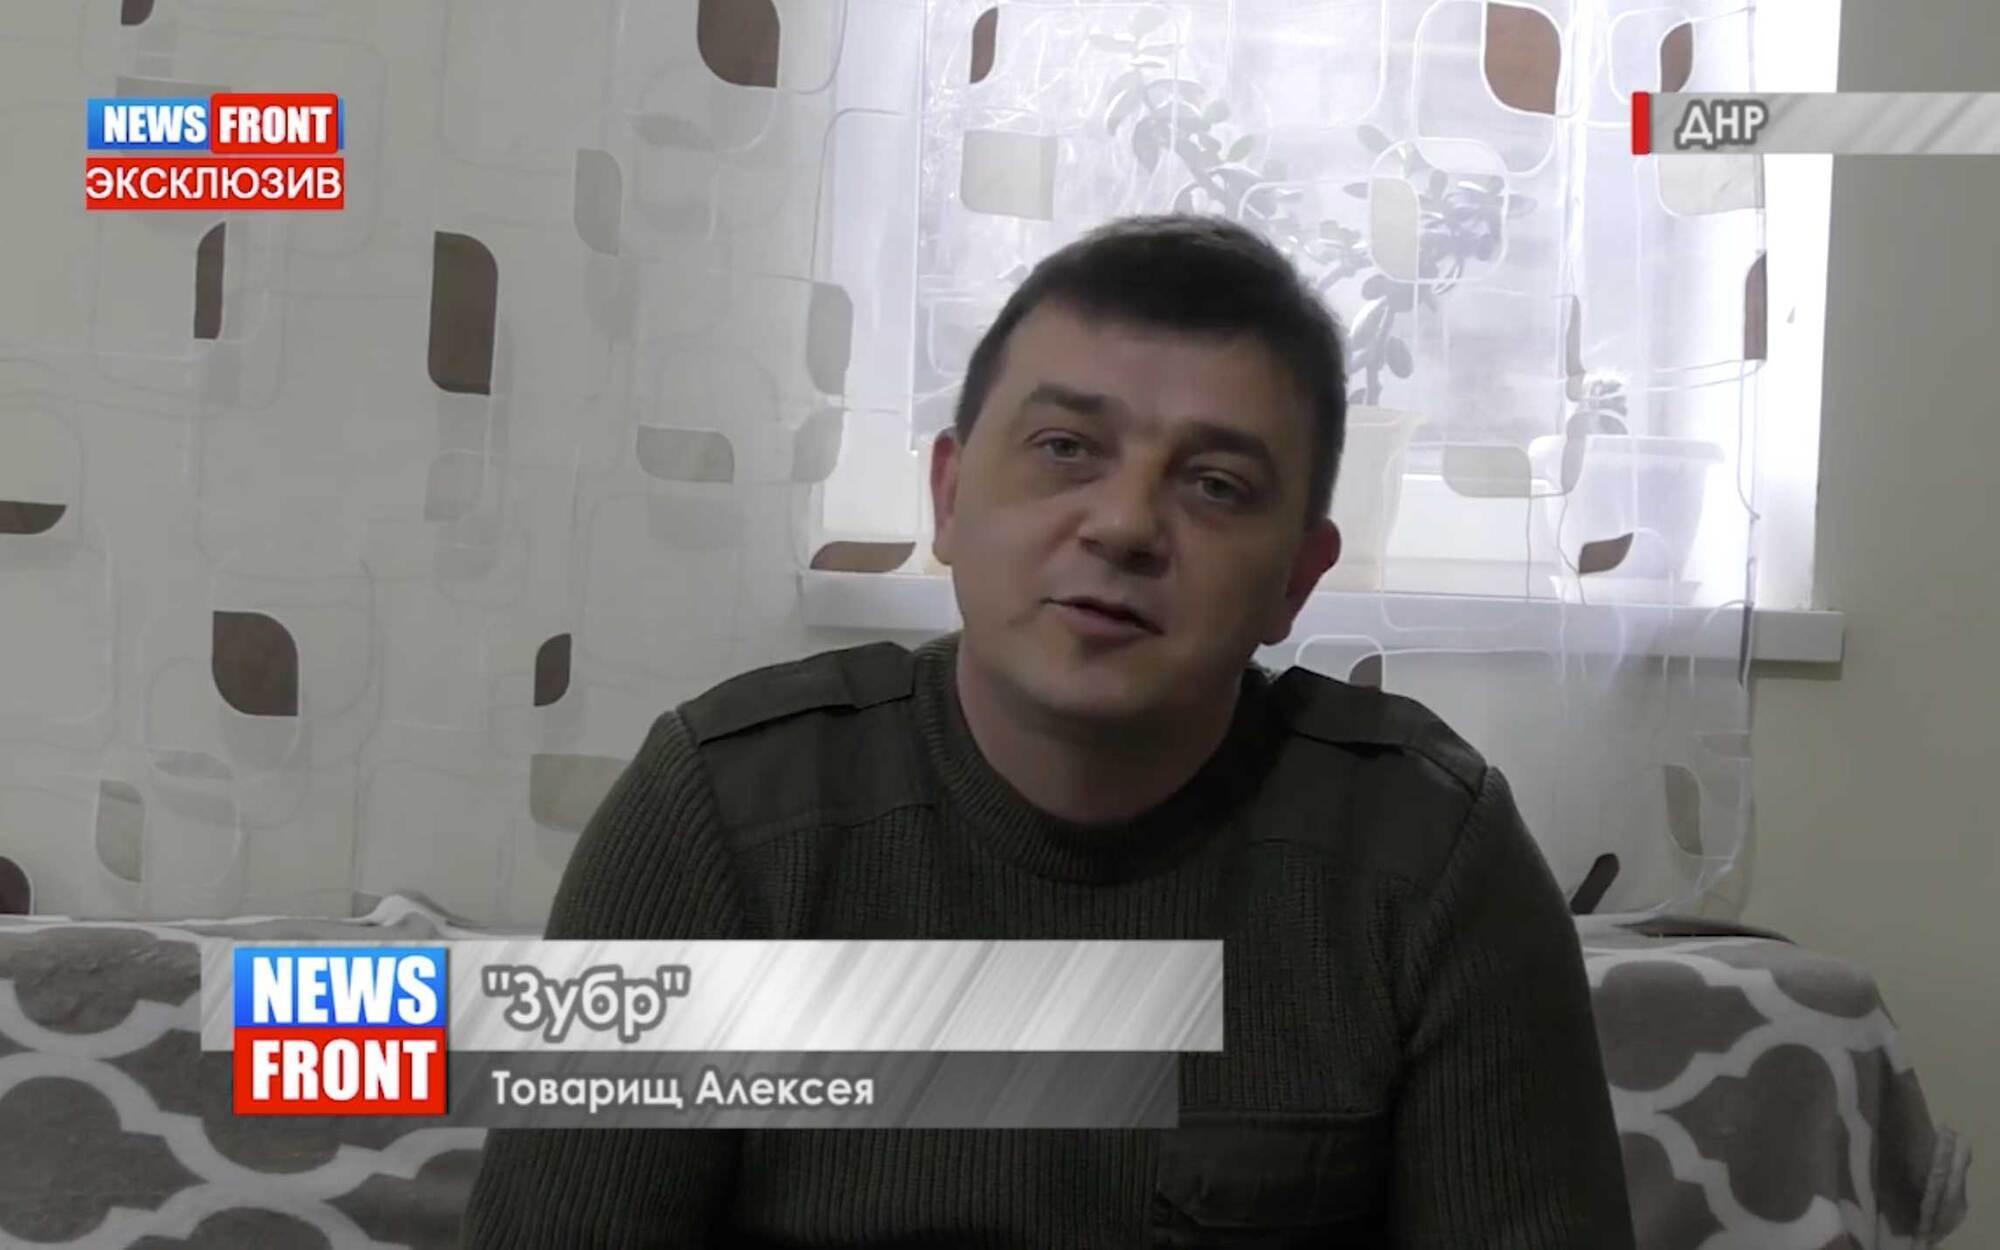 Олександр Зюбанов